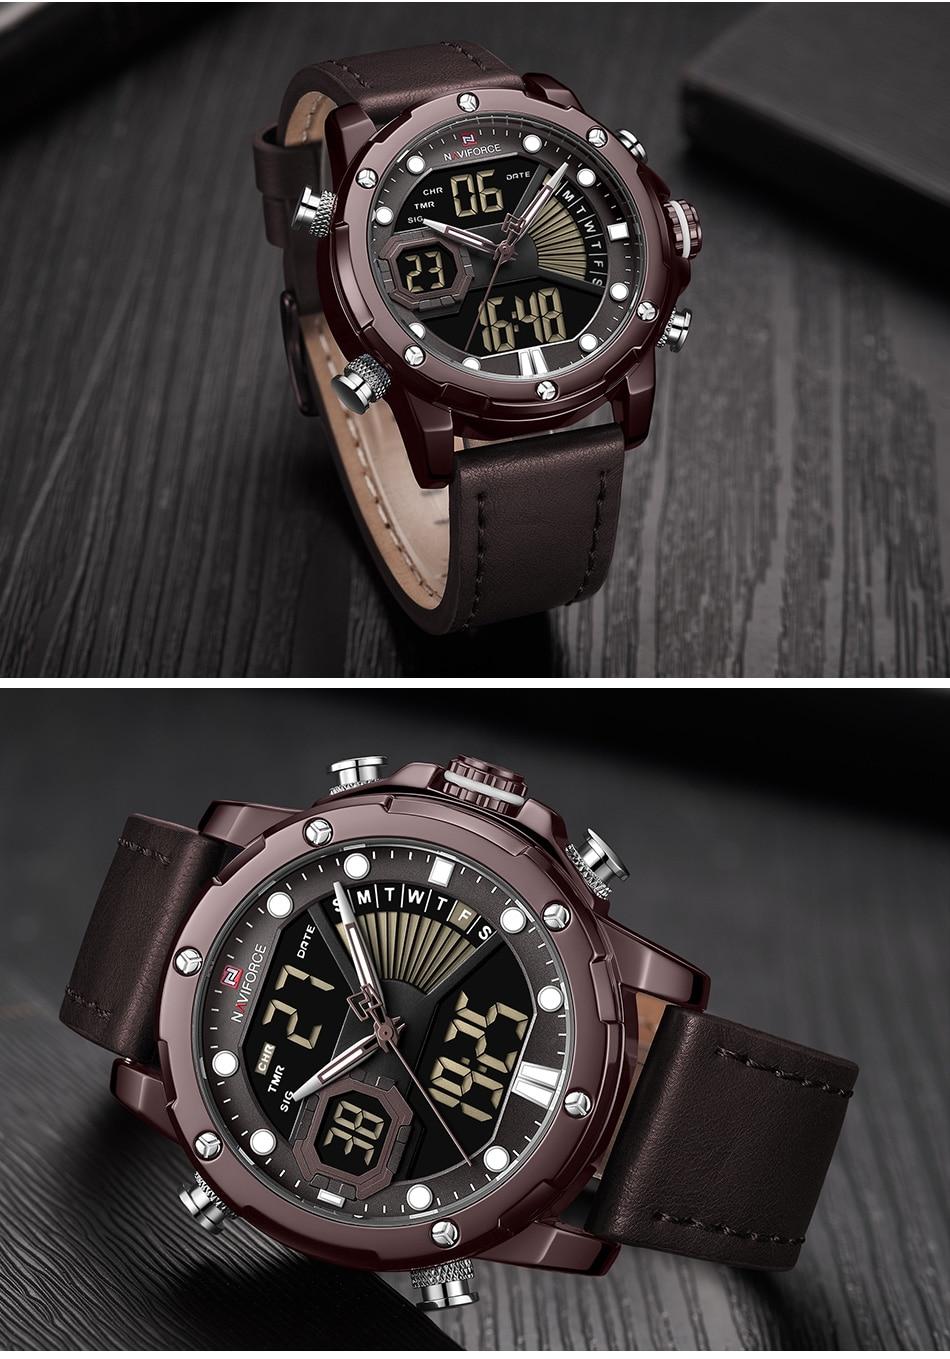 Hc2c1cdce463040838bad87da8bc2246en NAVIFORCE Men Watch Top Luxury Brand Fashion Sports Wristwatch